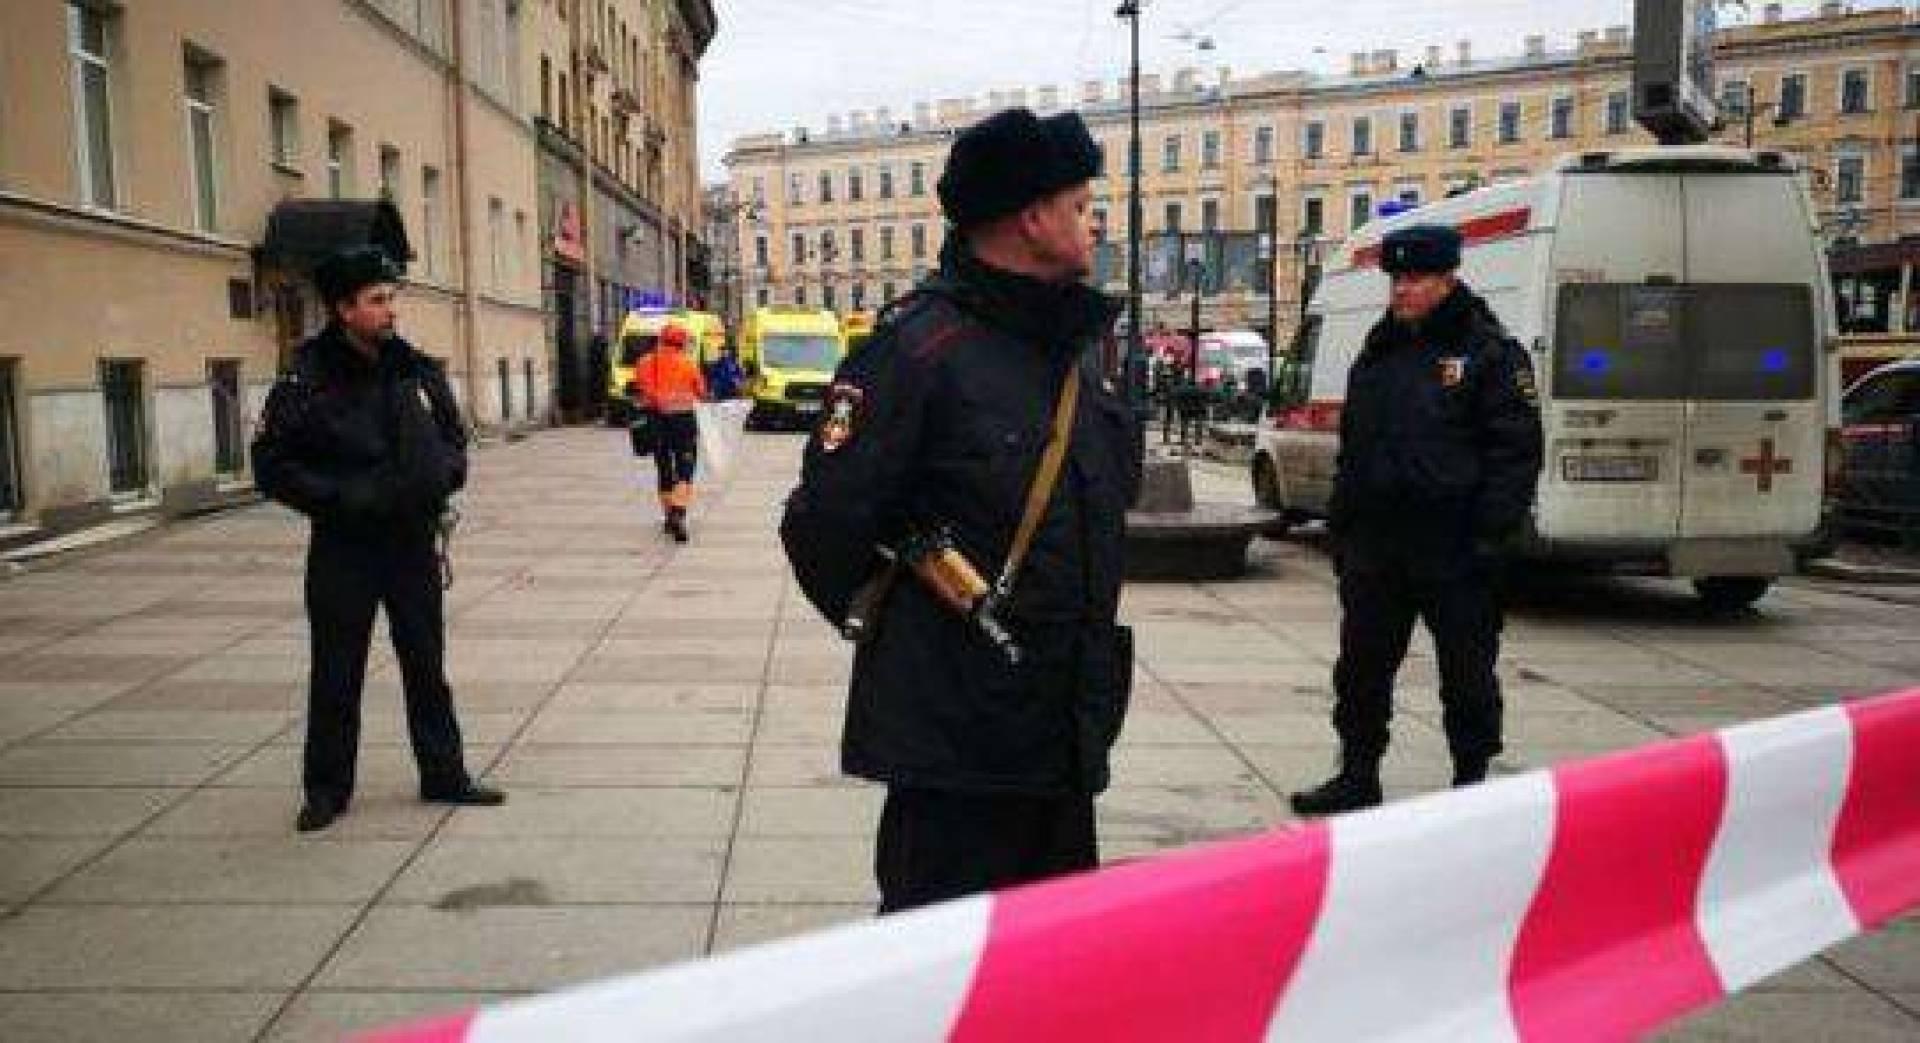 إحباط هجوم إرهابي في موسكو